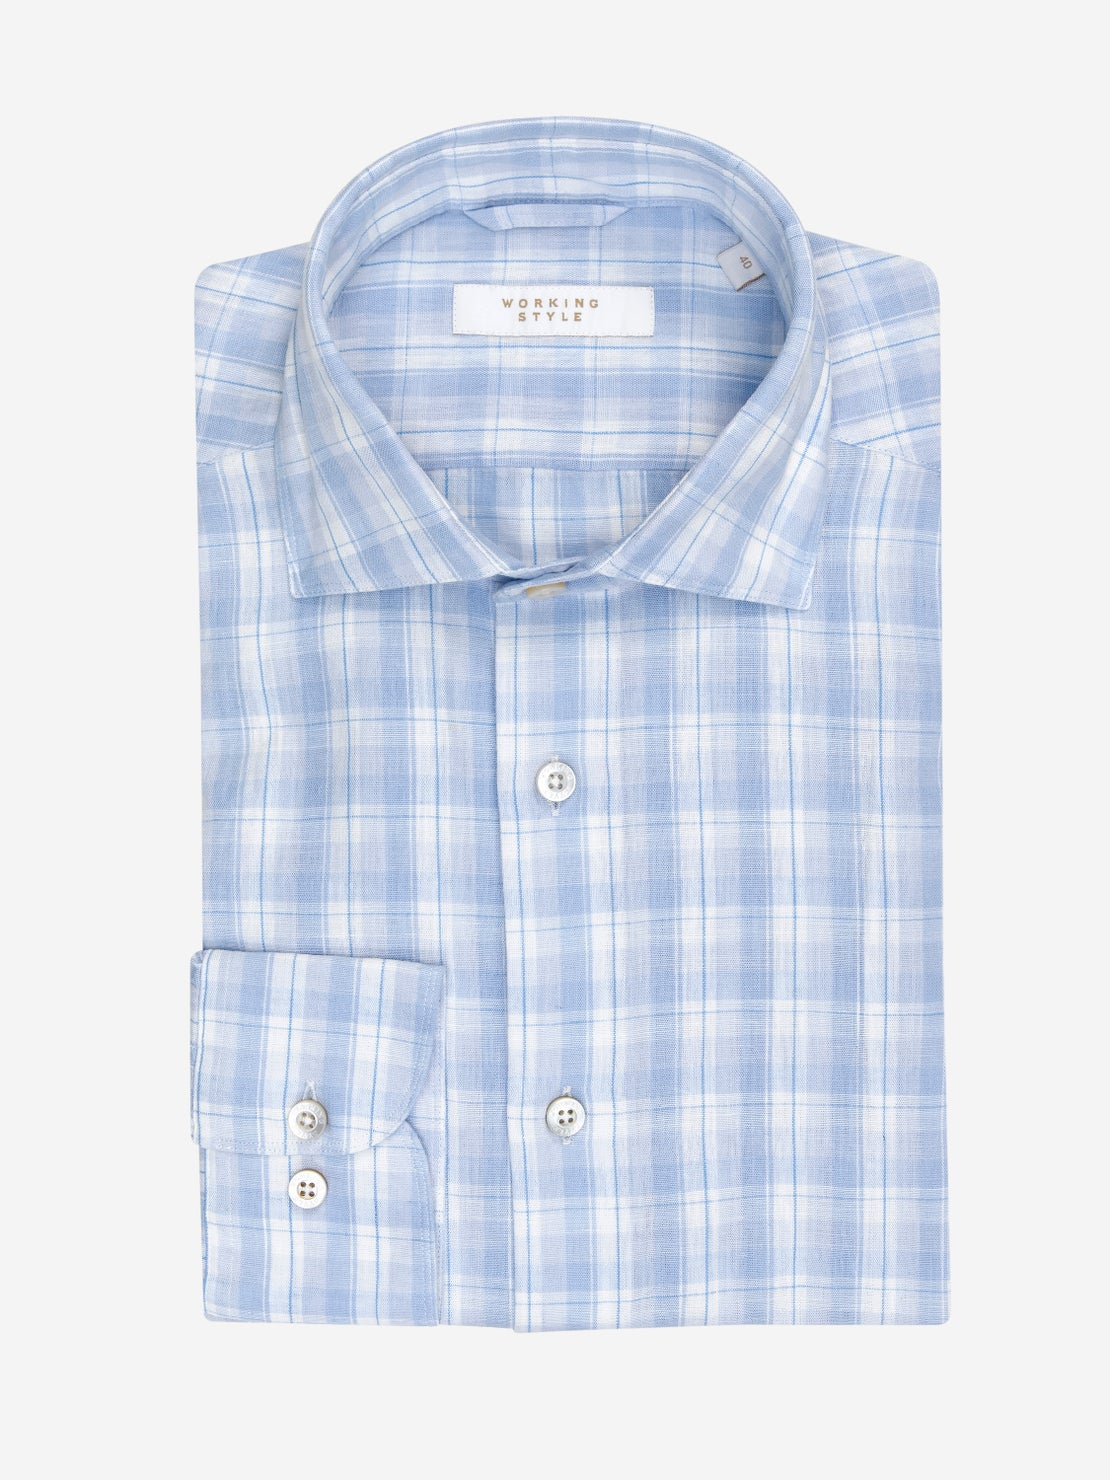 Pale Blue Check Shirt